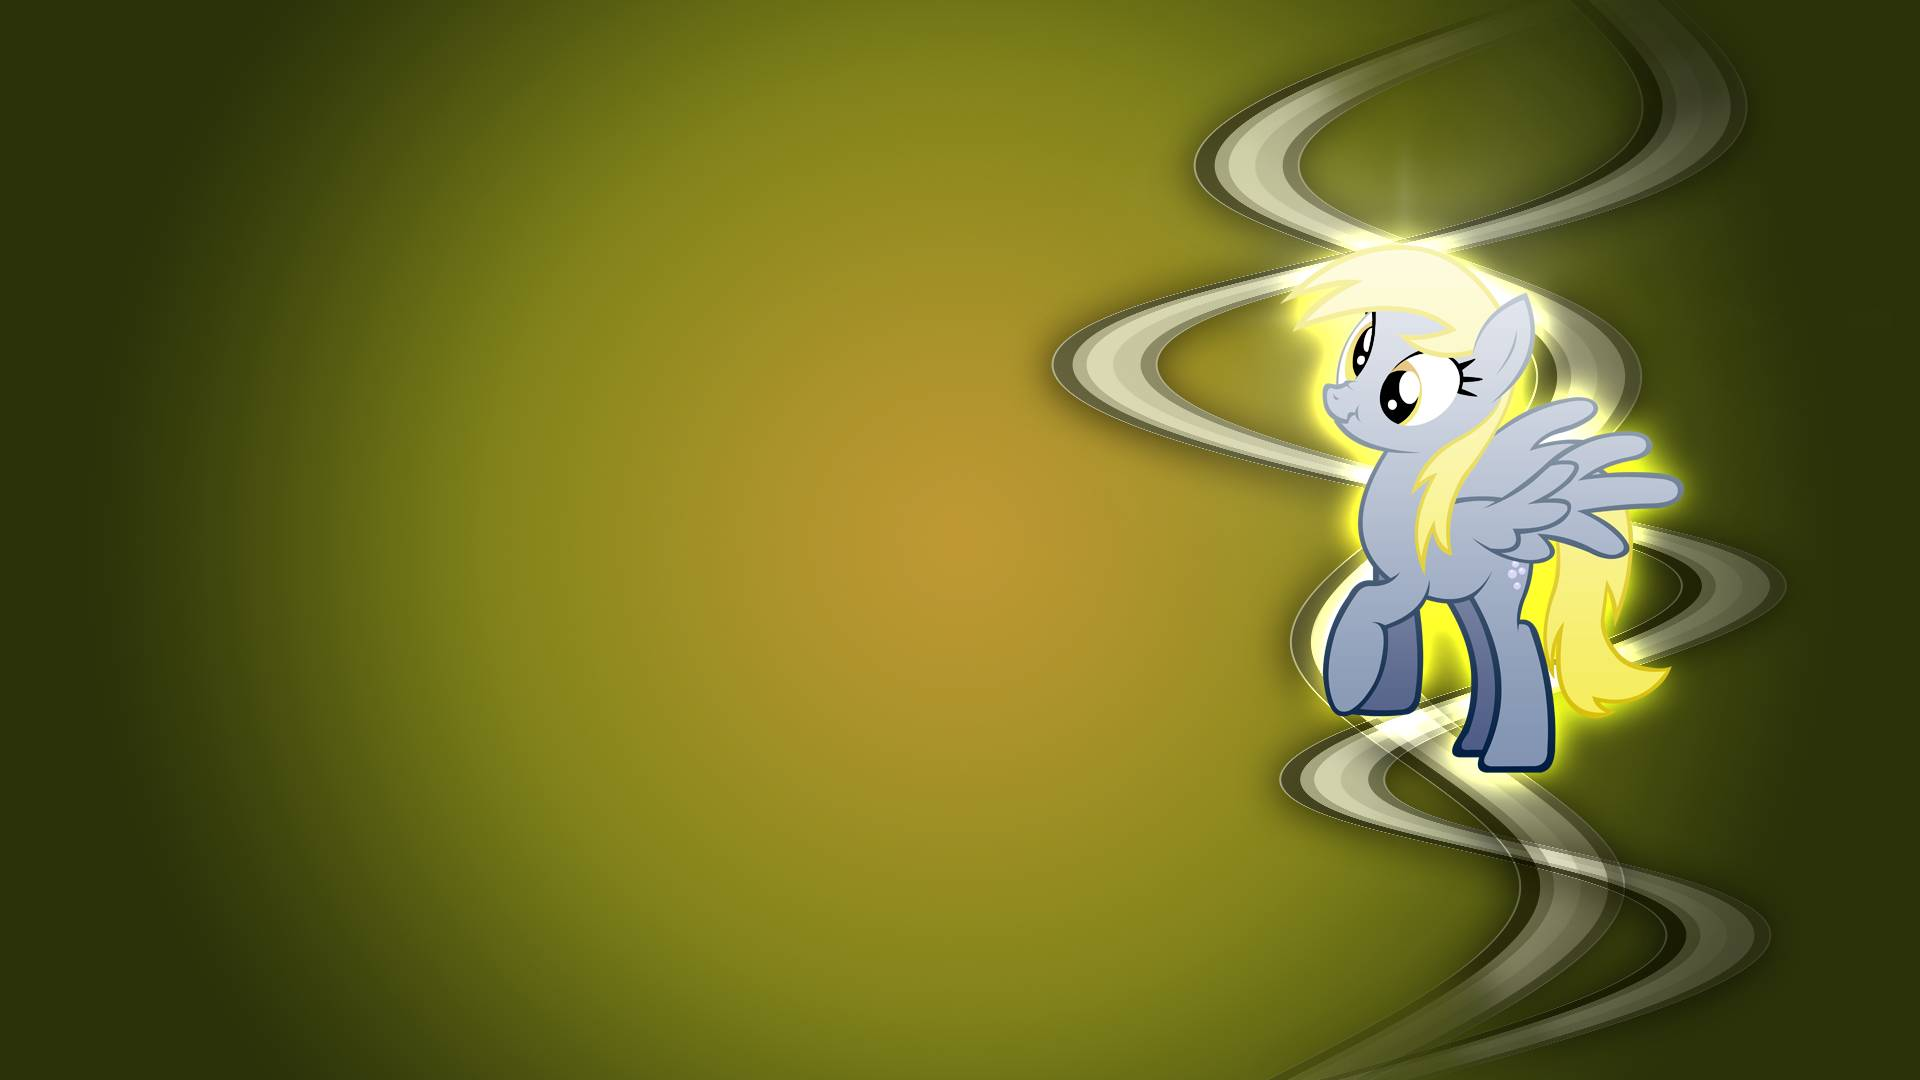 Derpy Wallpapur   My Little Pony Friendship is Magic Wallpaper 1920x1080